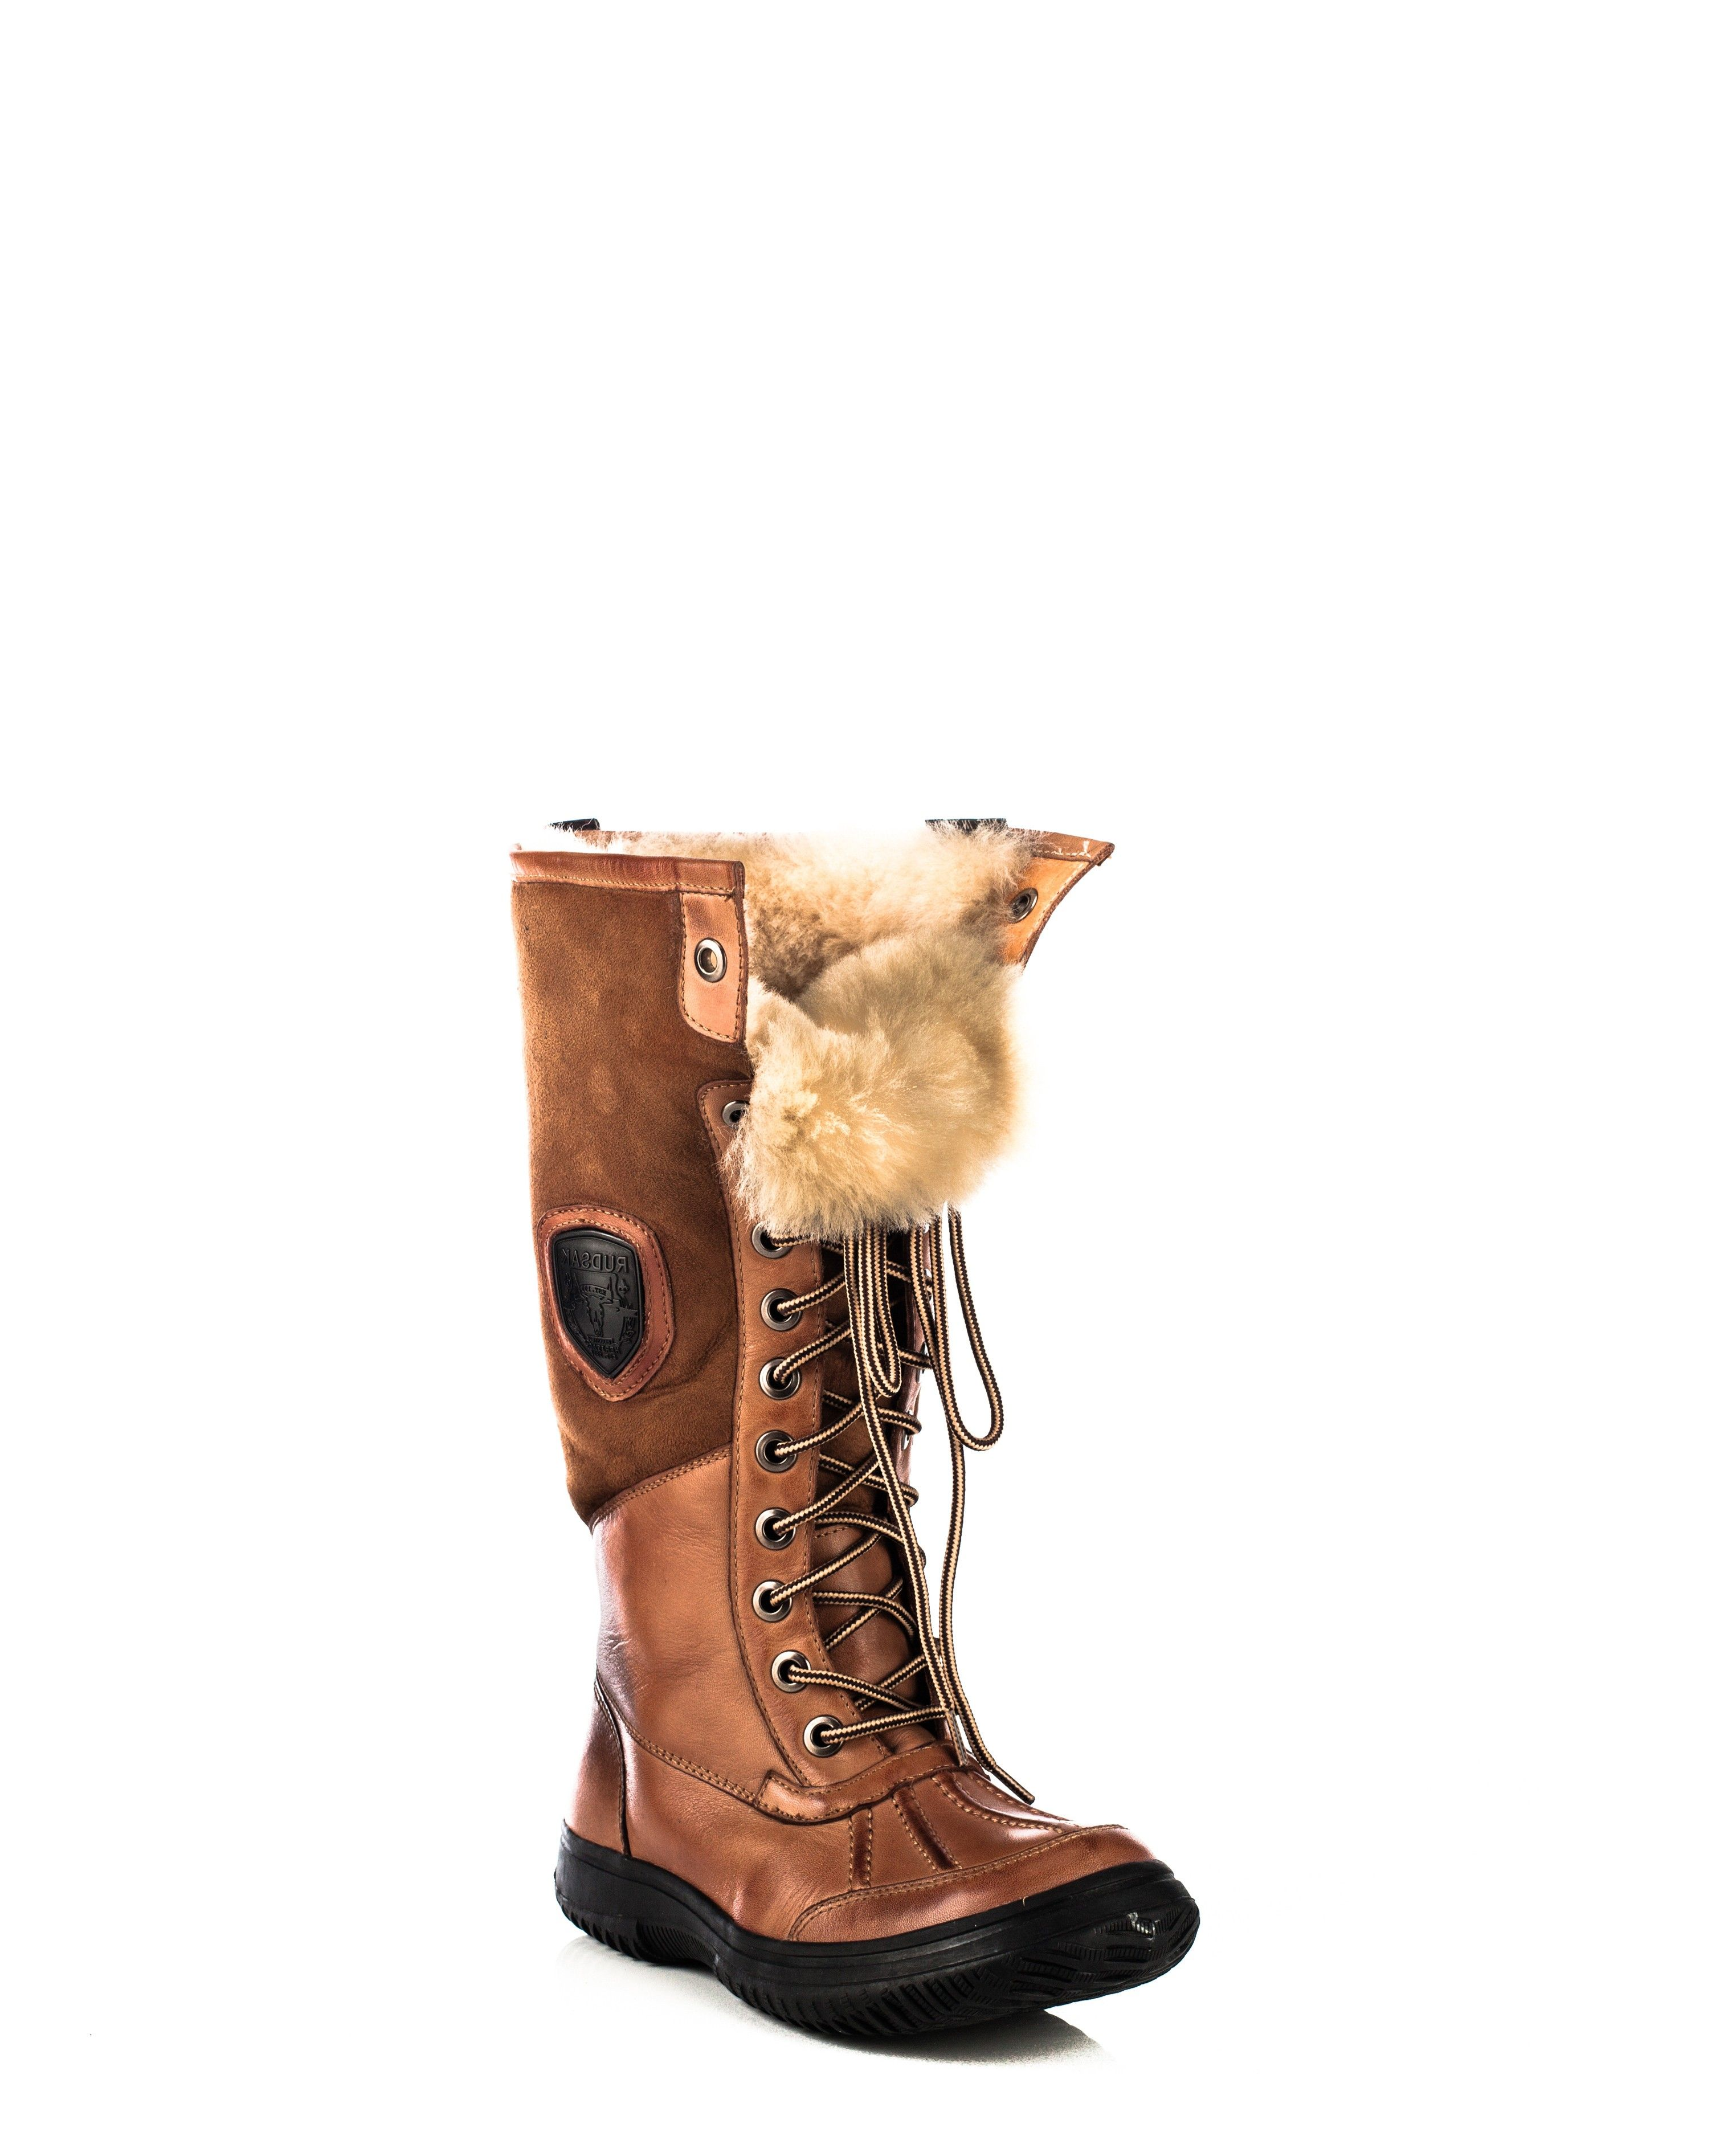 Rudsak Online Sample Sale Offer Tan Leather Buena